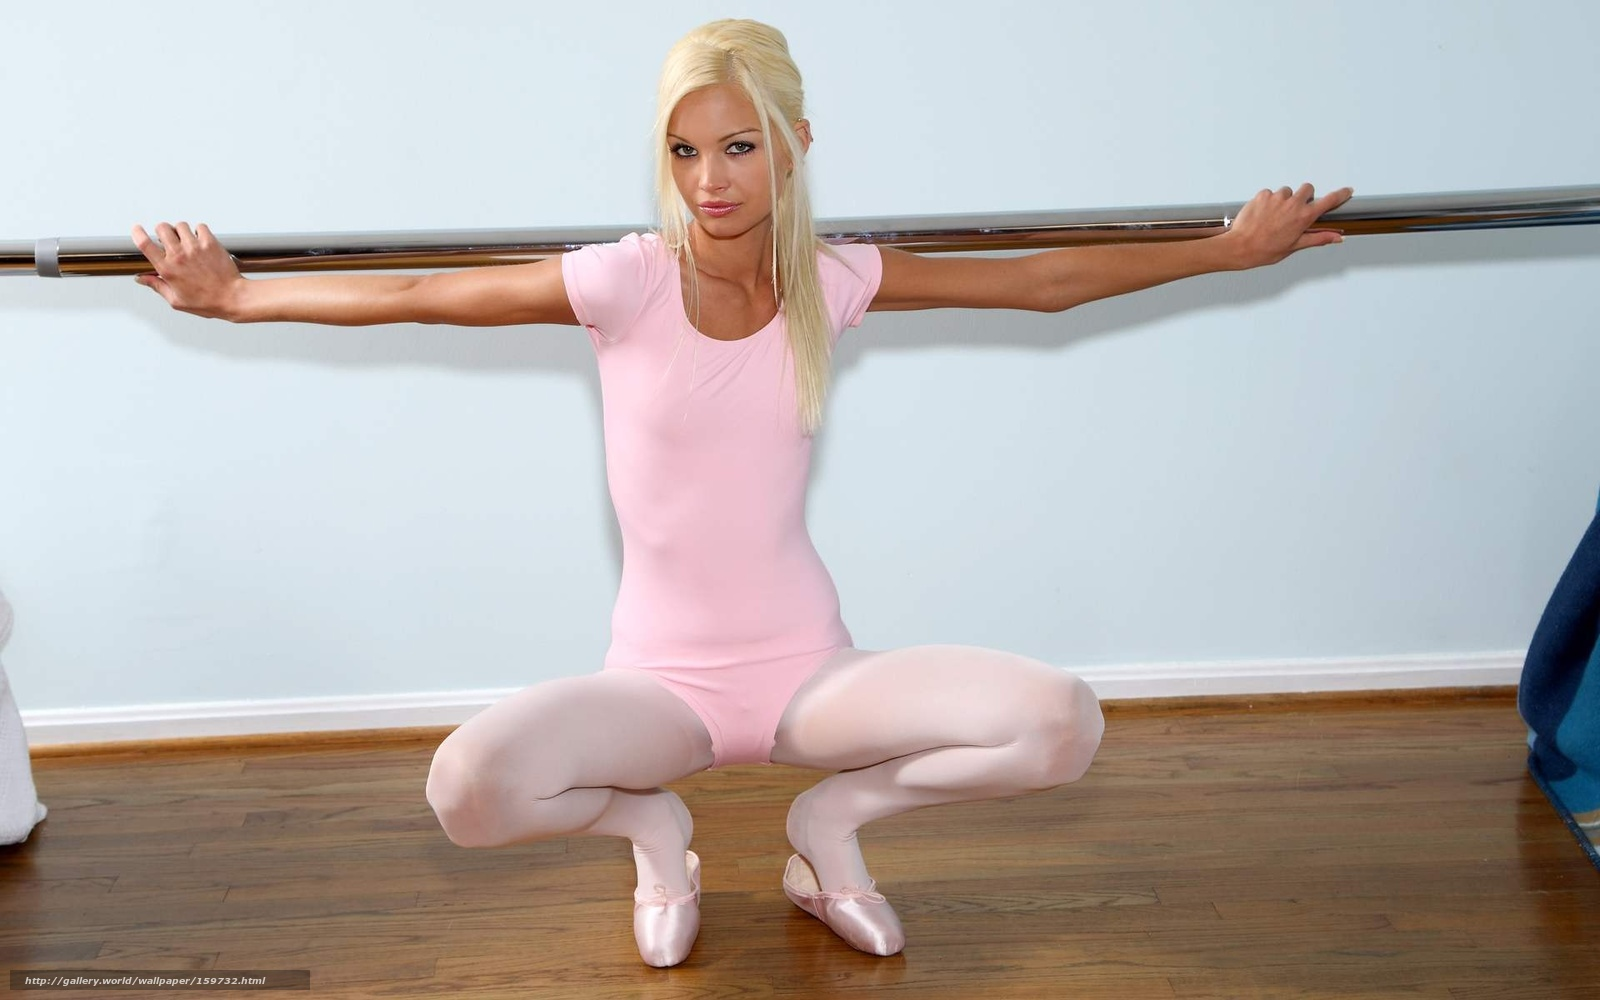 Фотопорно женщин гимнасток и балерин фото 405-305